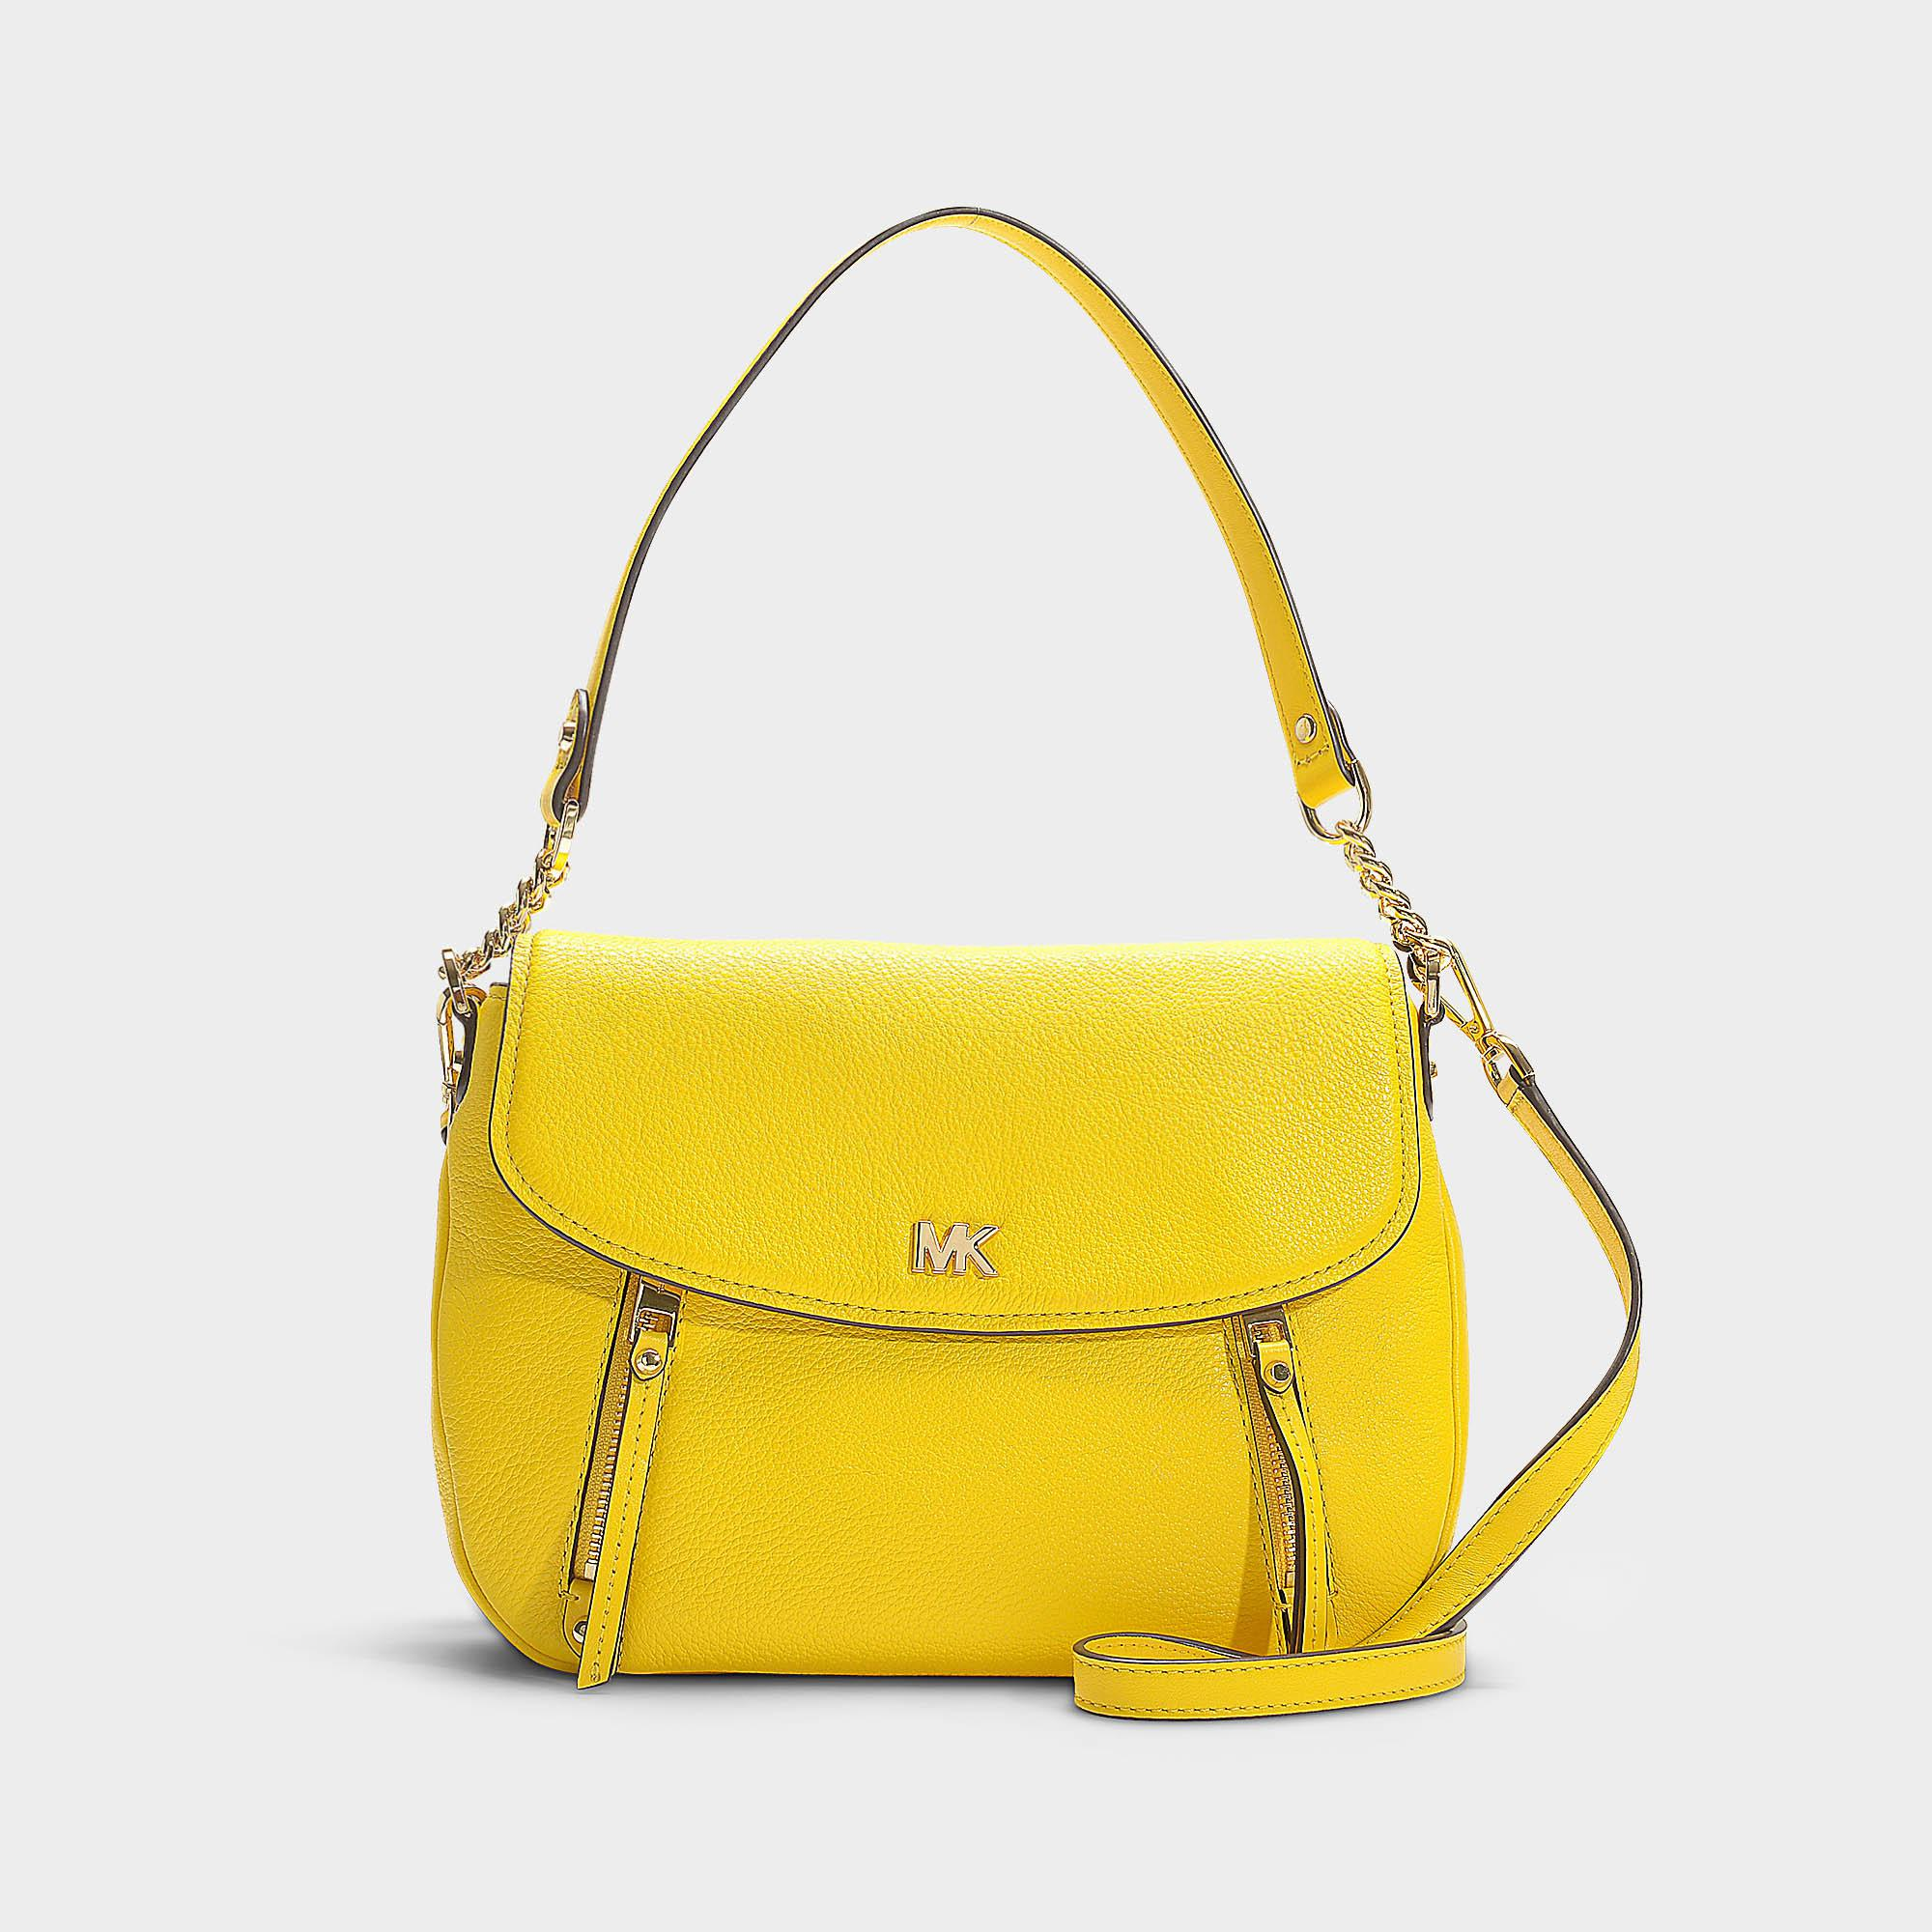 1d88f9de4319 MICHAEL Michael Kors Evie Medium Shoulder Flap Bag In Sunflower ...